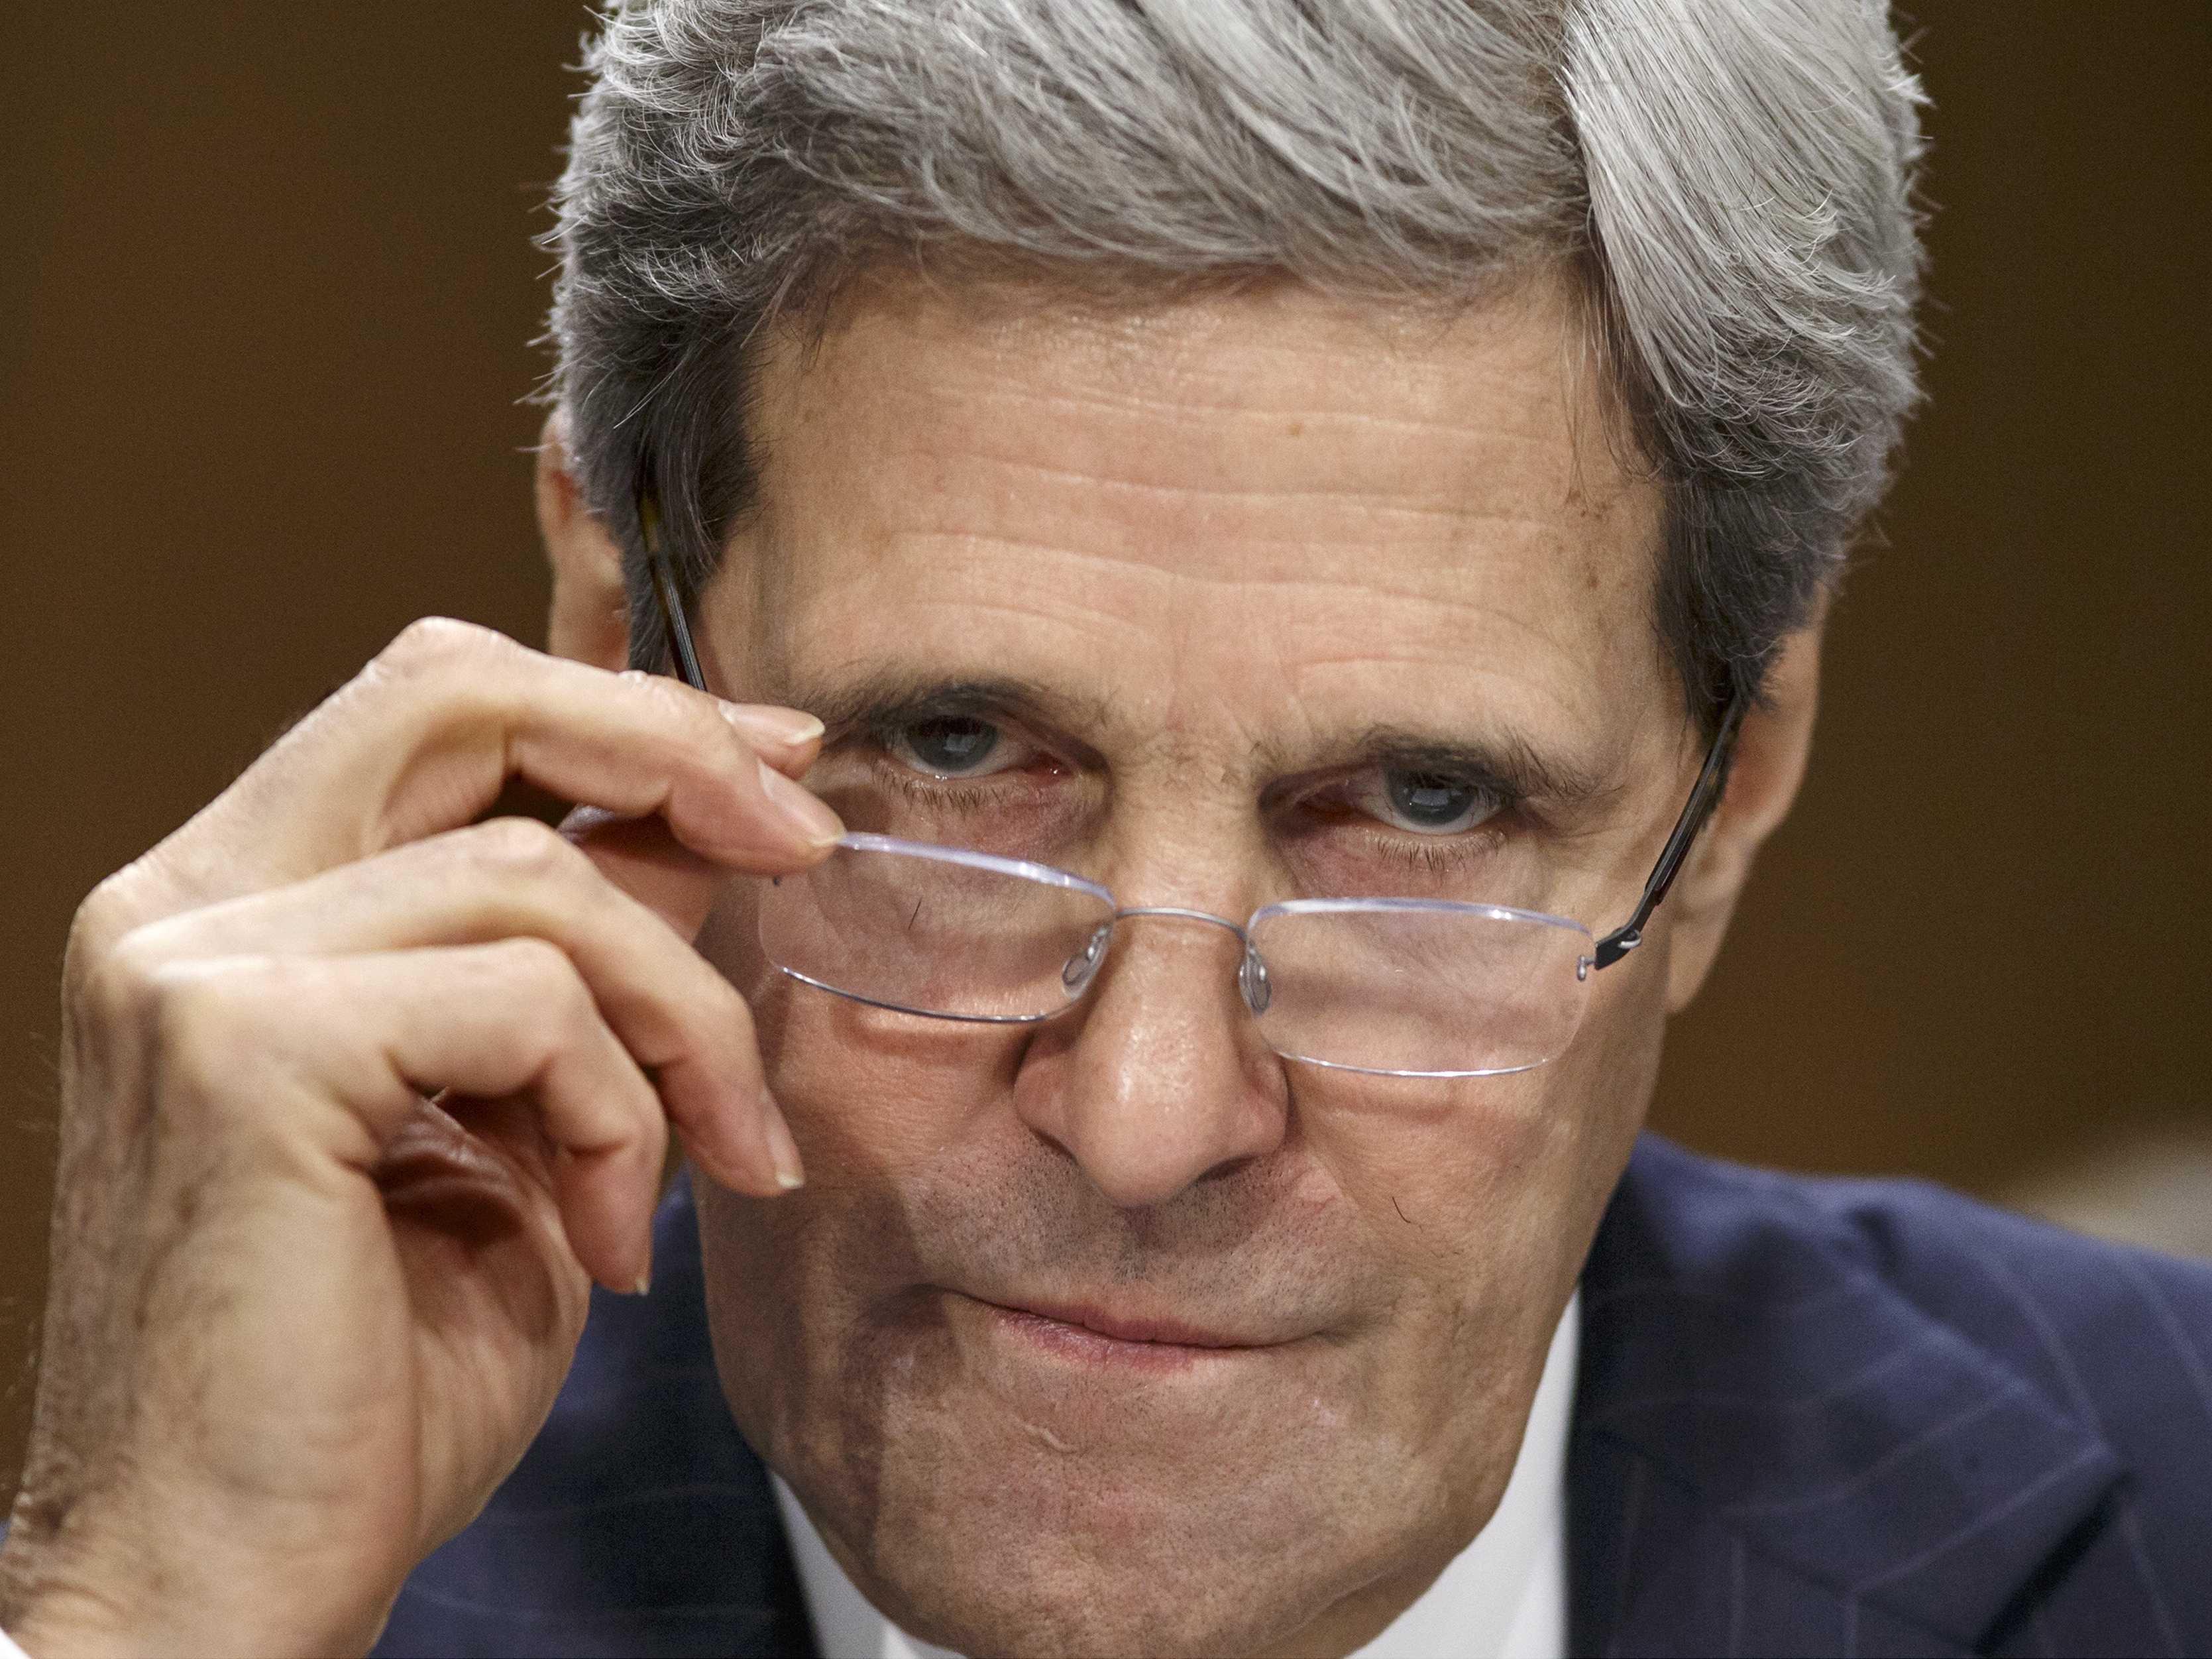 Bienvenido, Míster Kerry